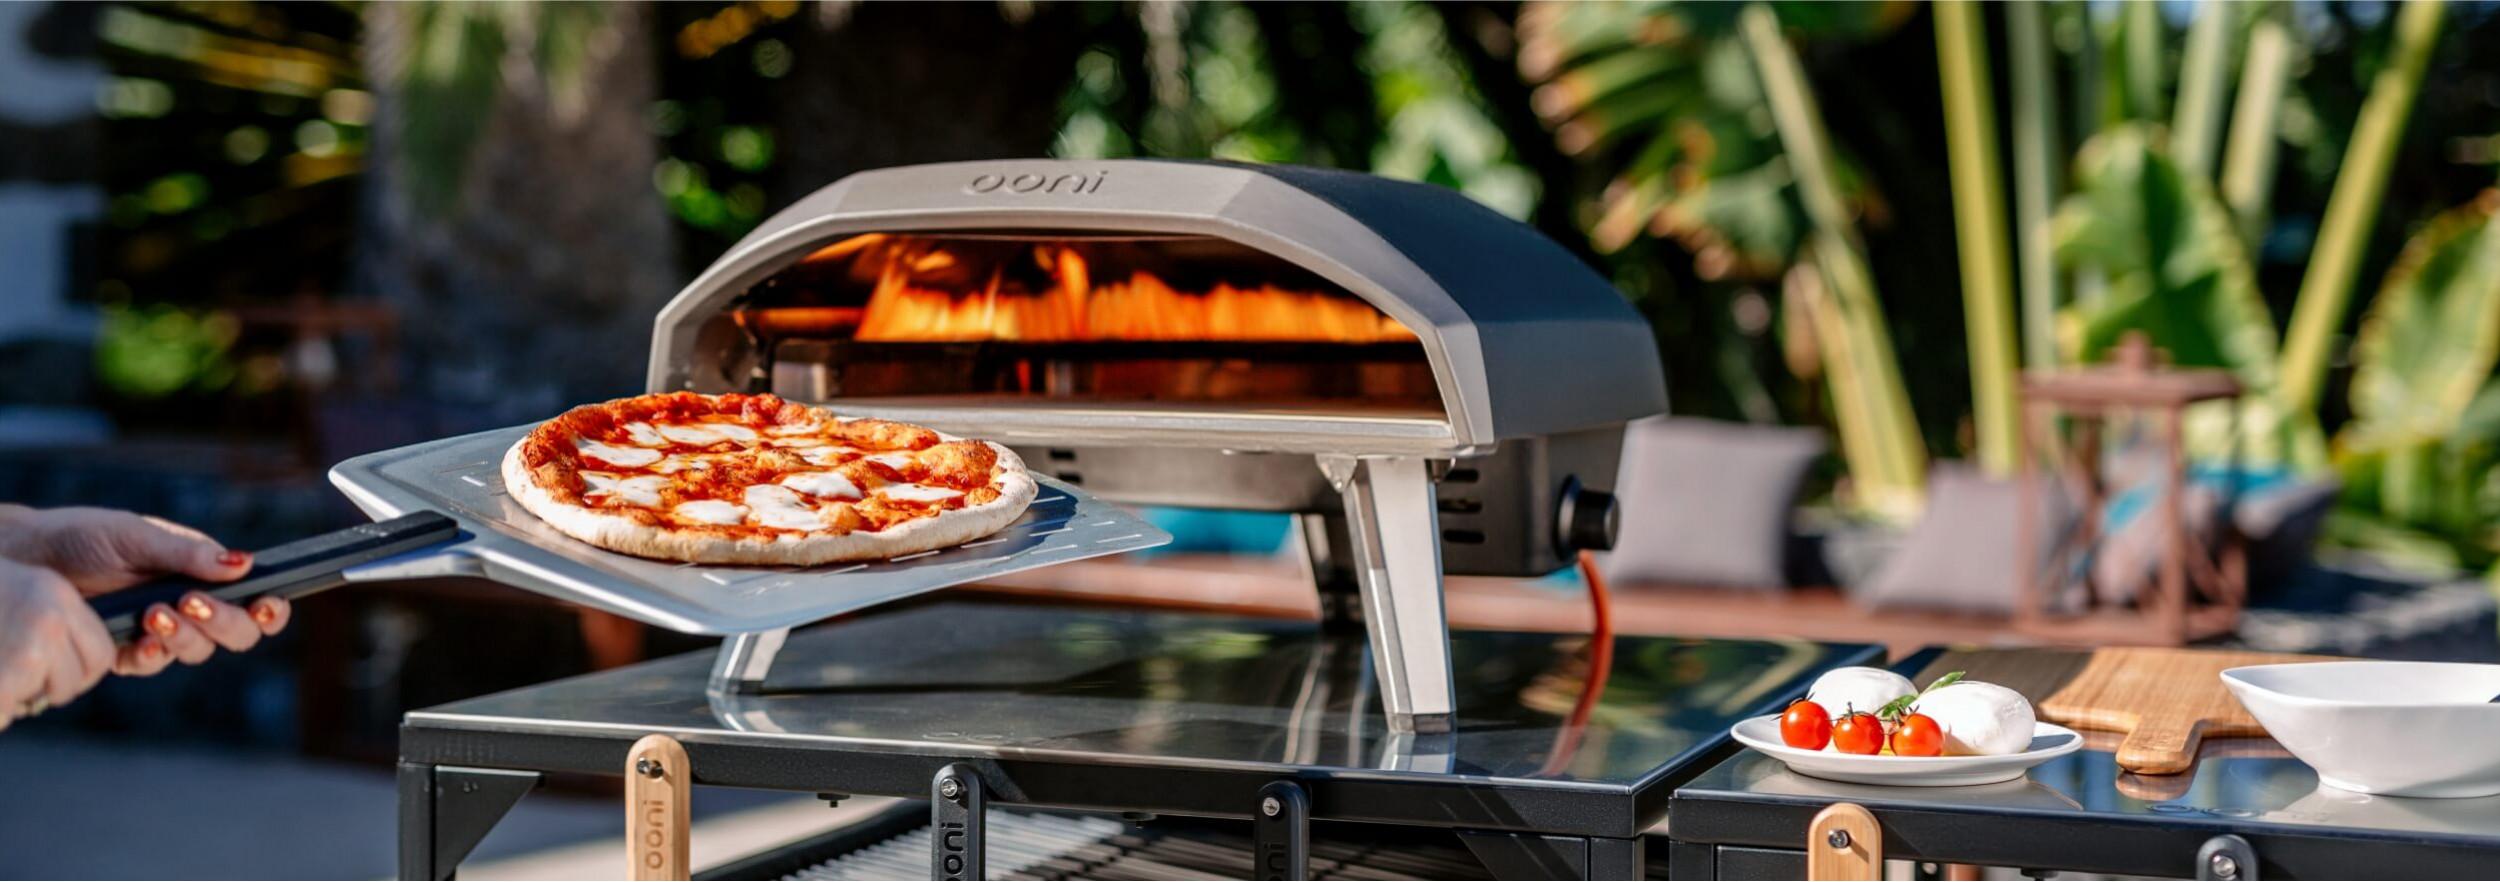 Ooni_pizza_ovens-2500x882h